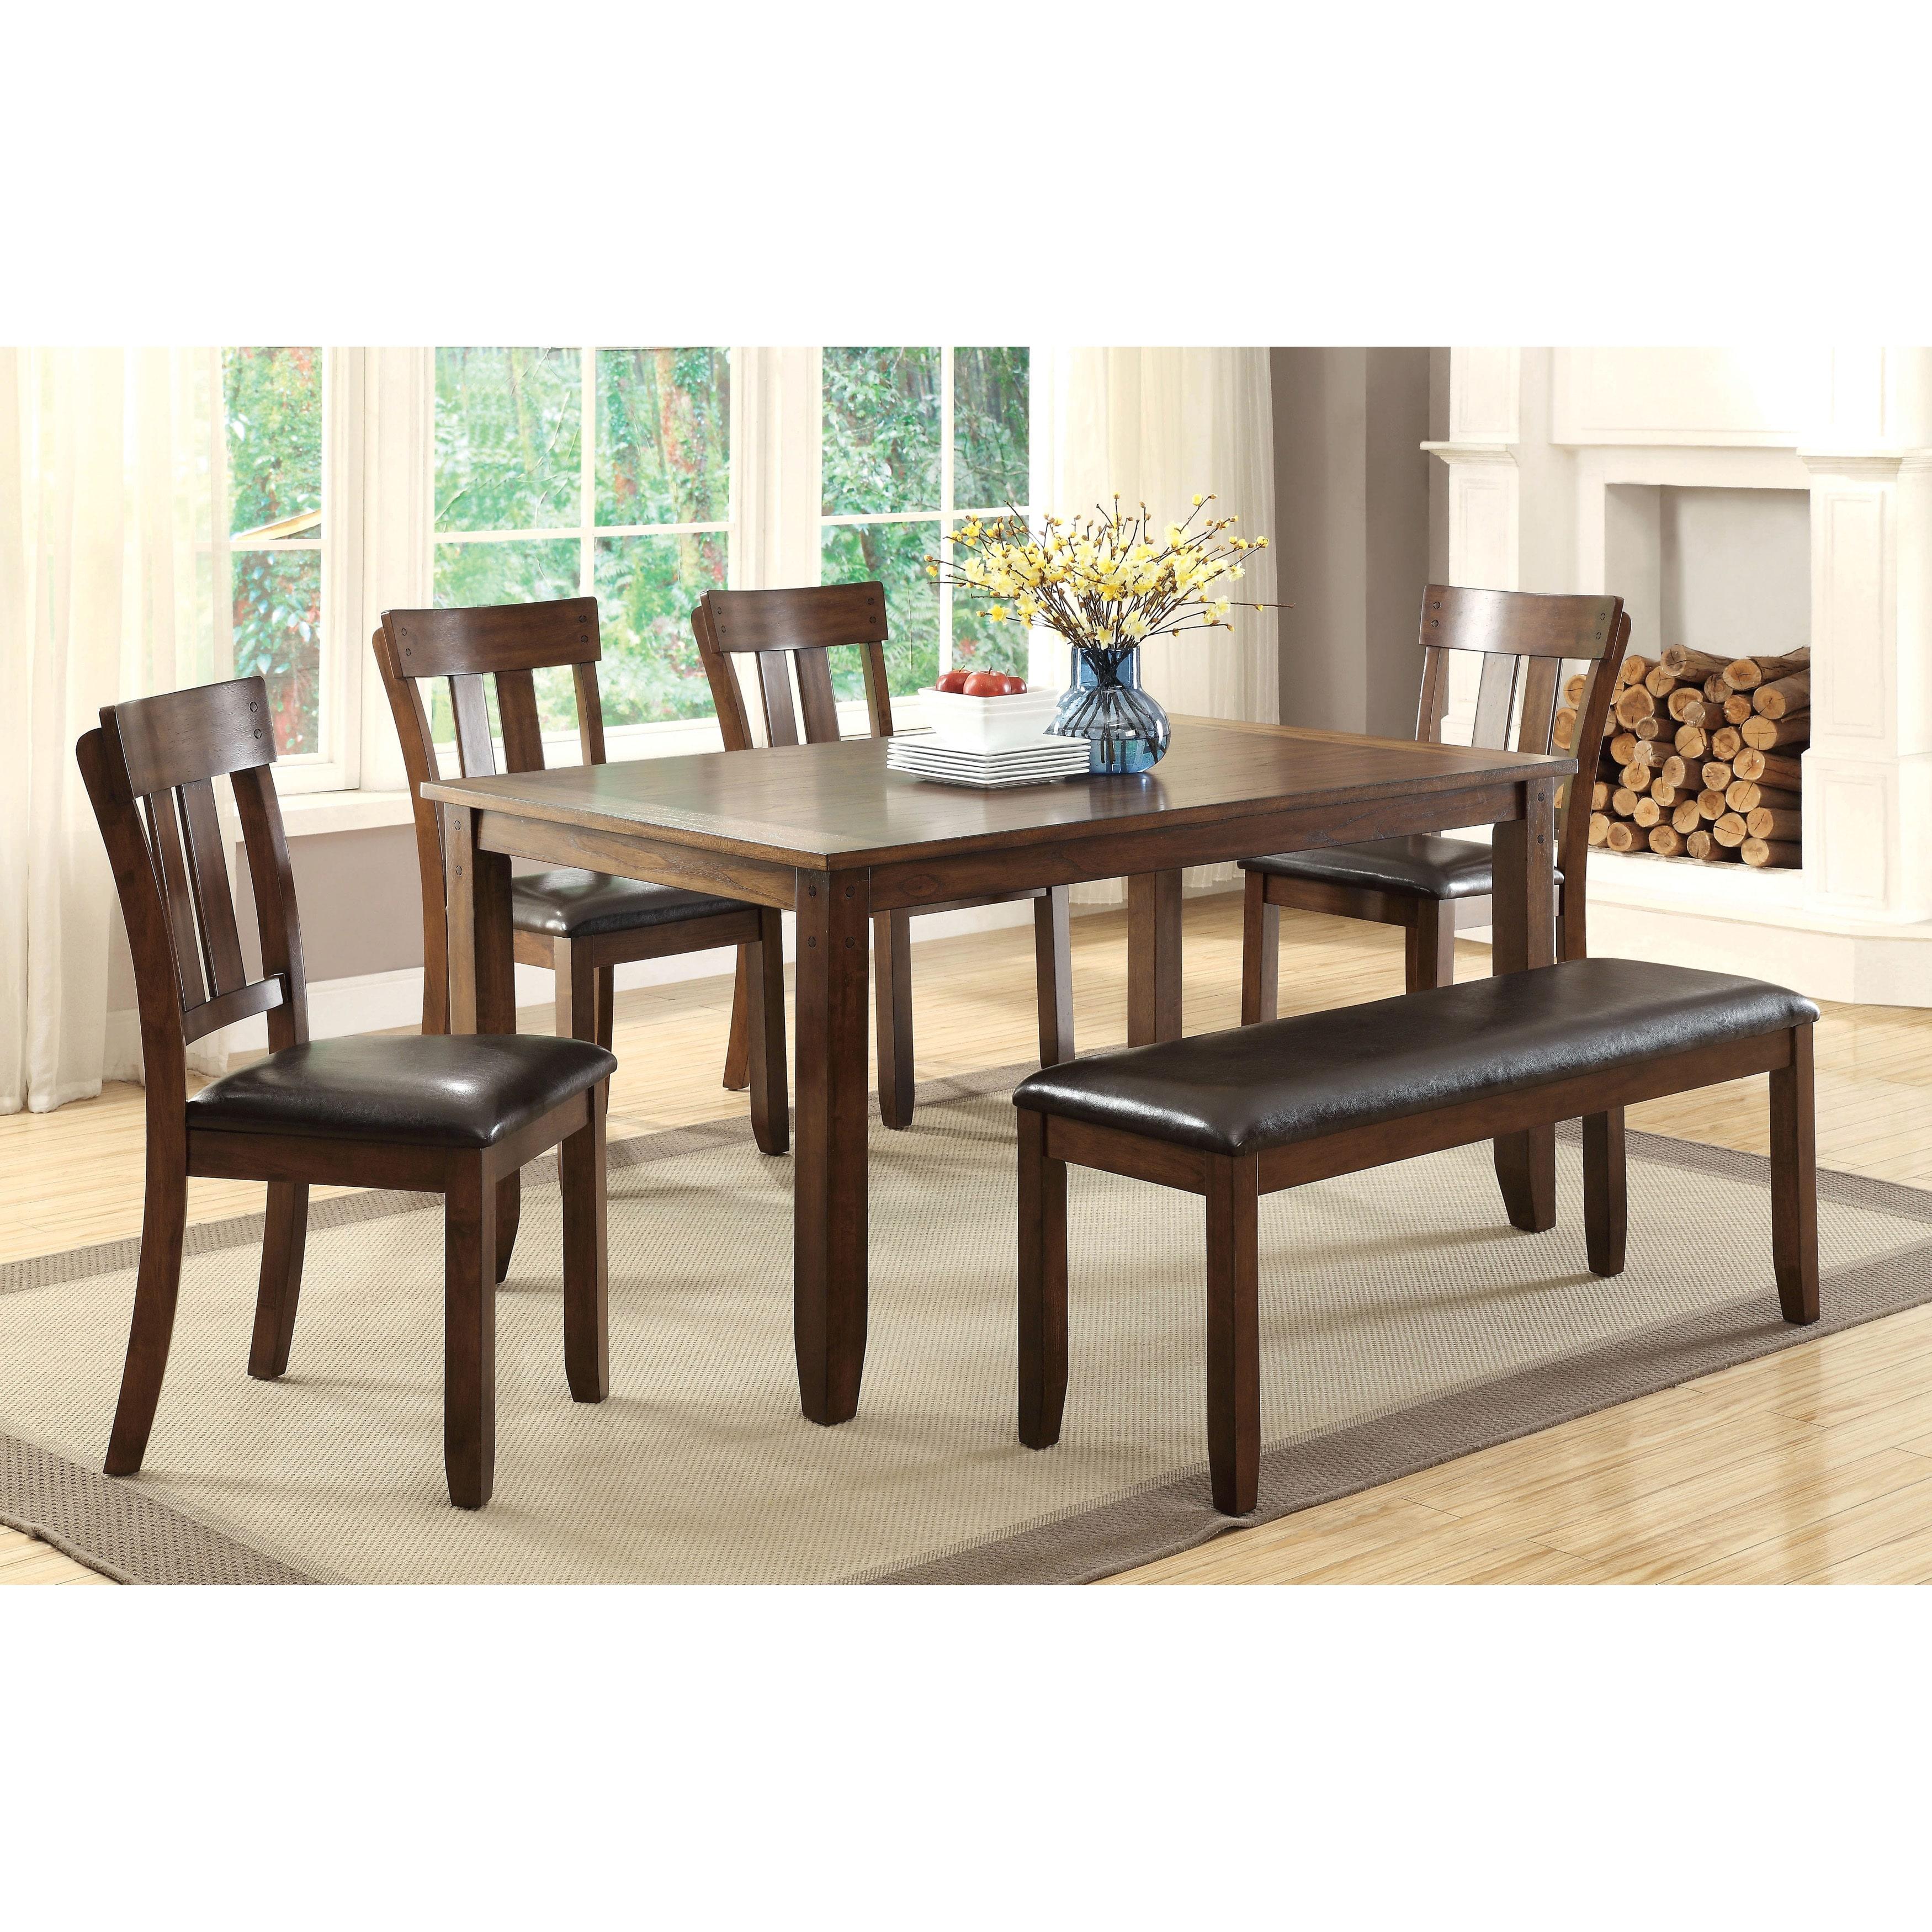 Furniture Of America Casington Country Style Rustic Oak 64 Inch